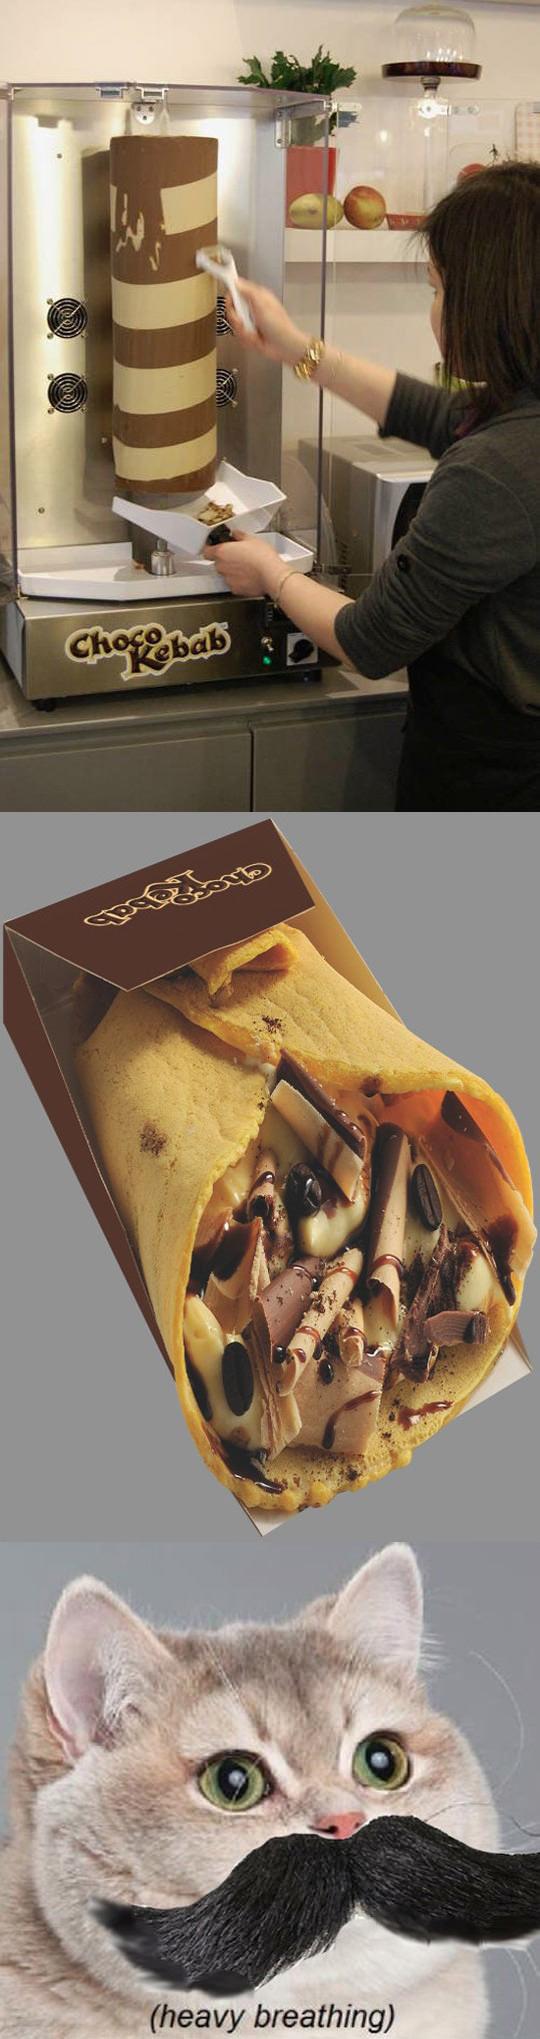 cool-chocolate-kebab-delicious-preparation